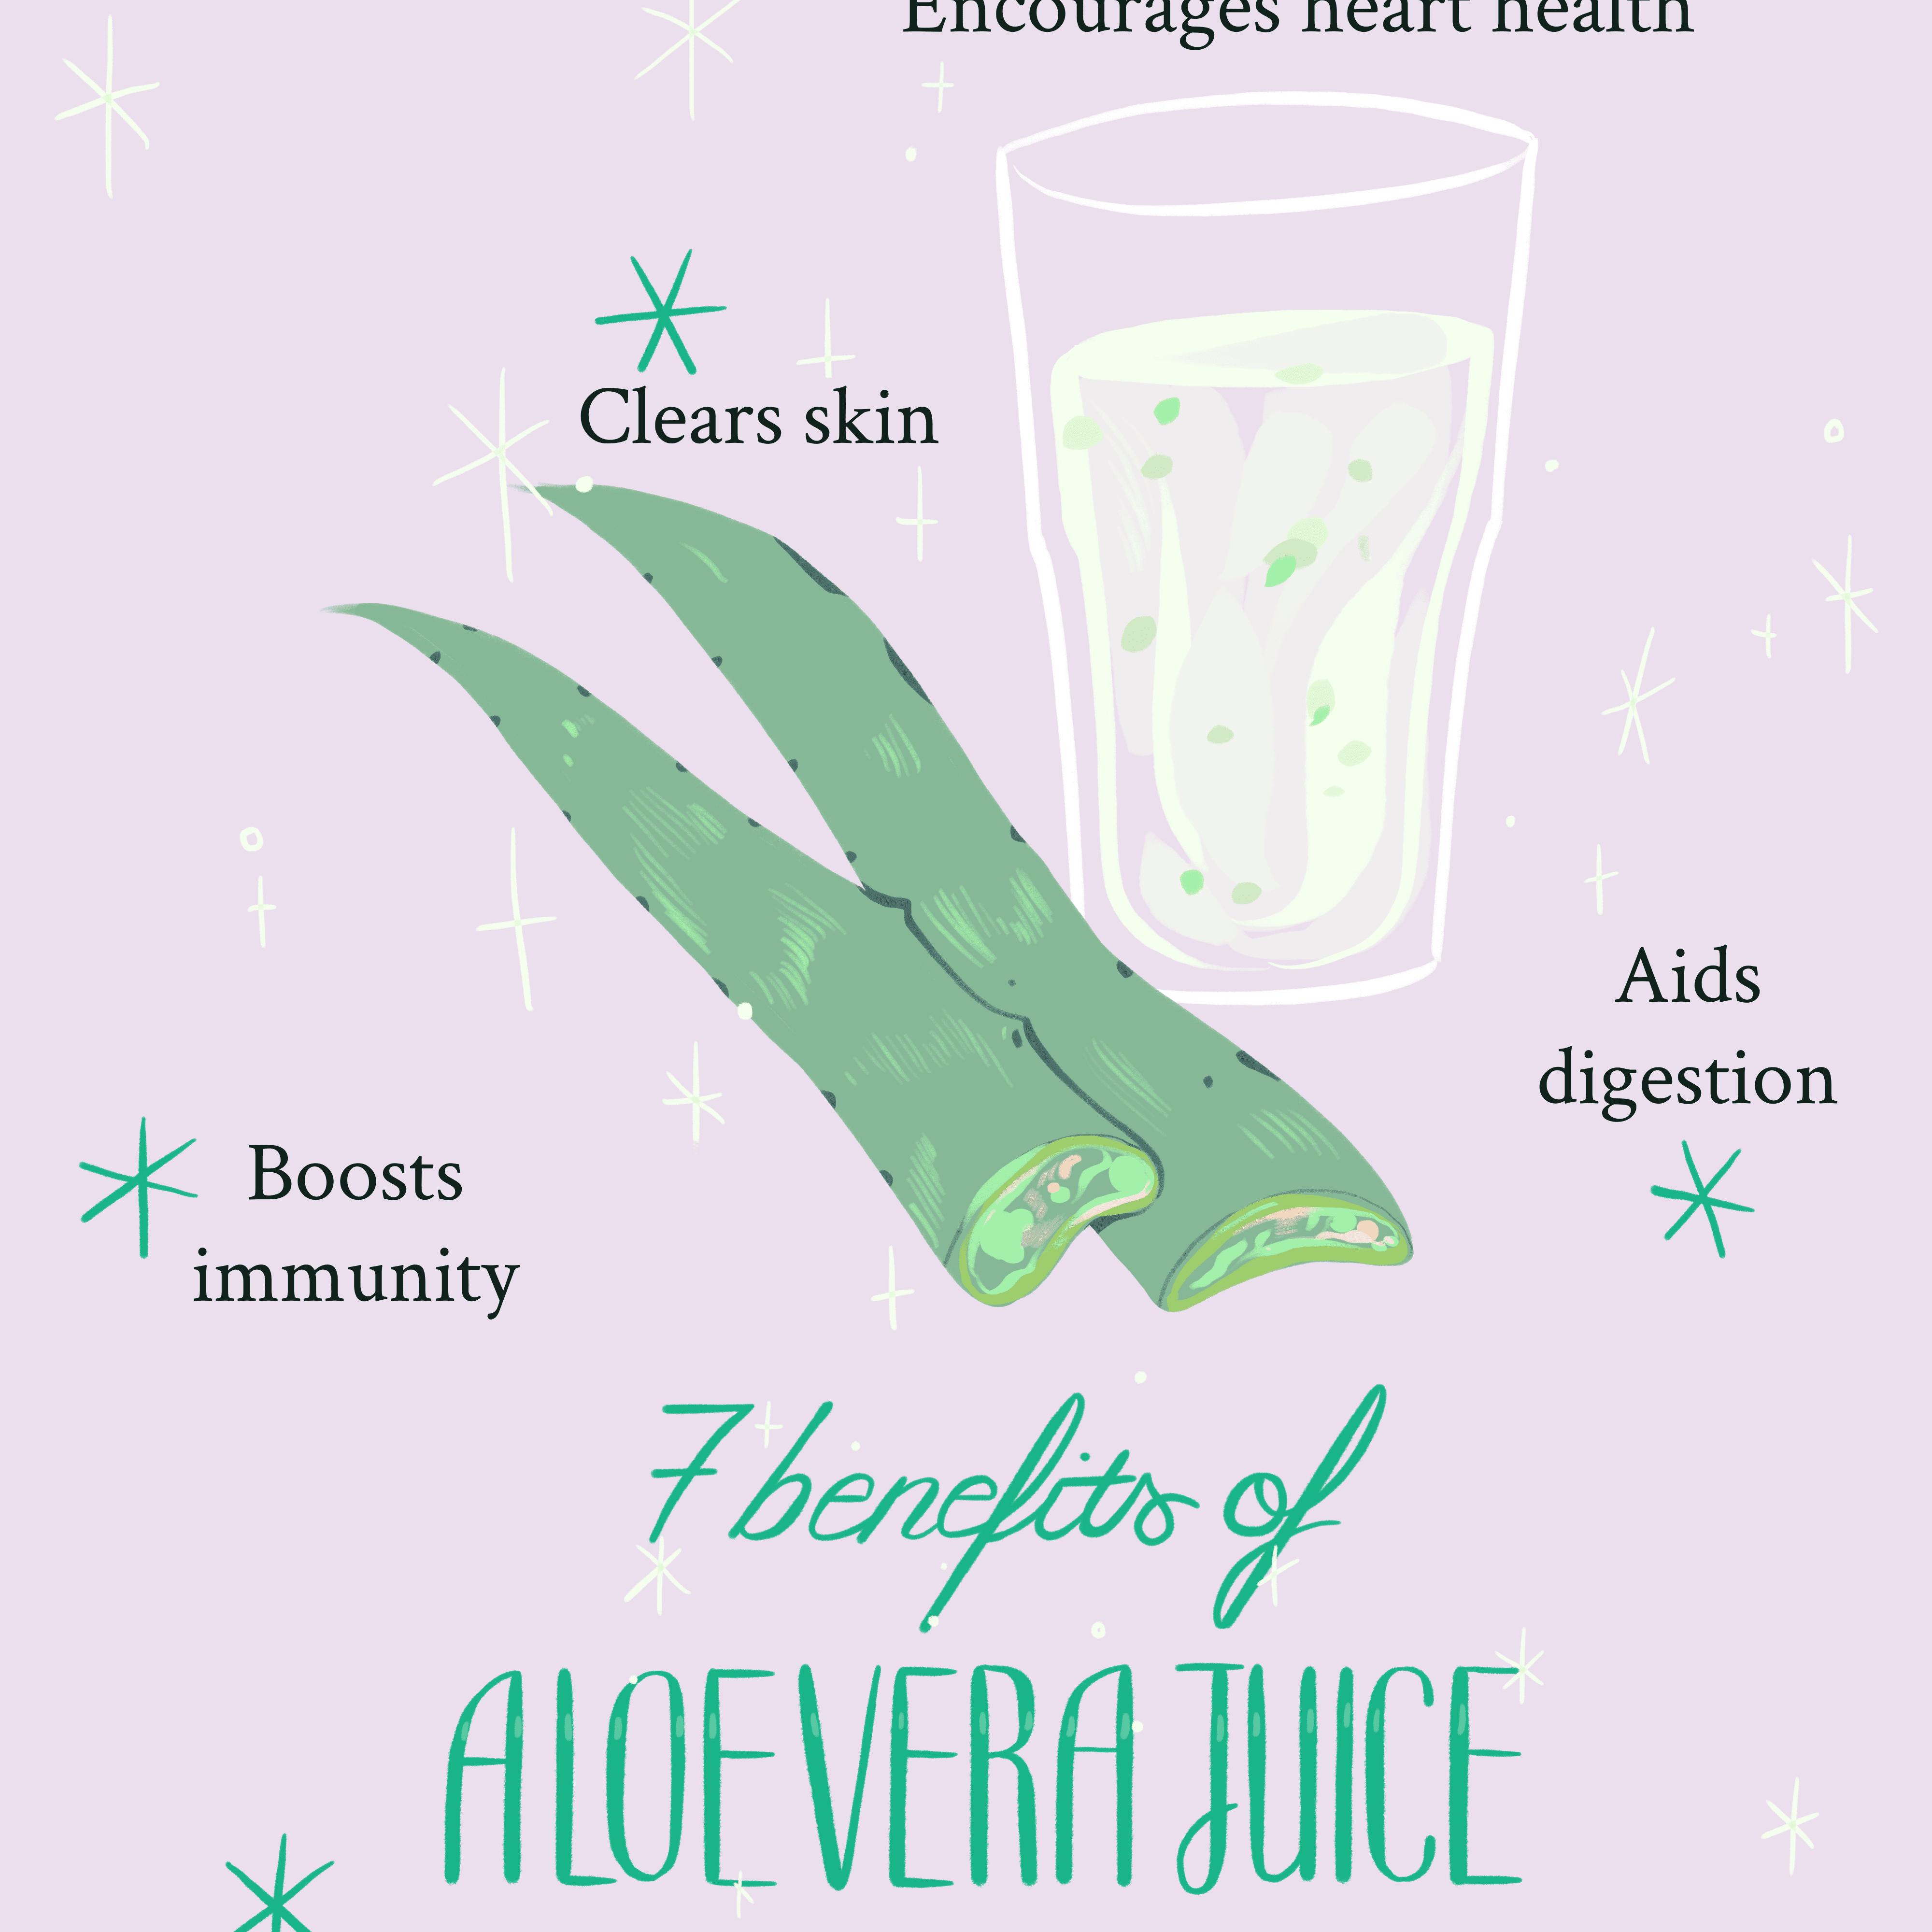 7 aloe vera juice benefits